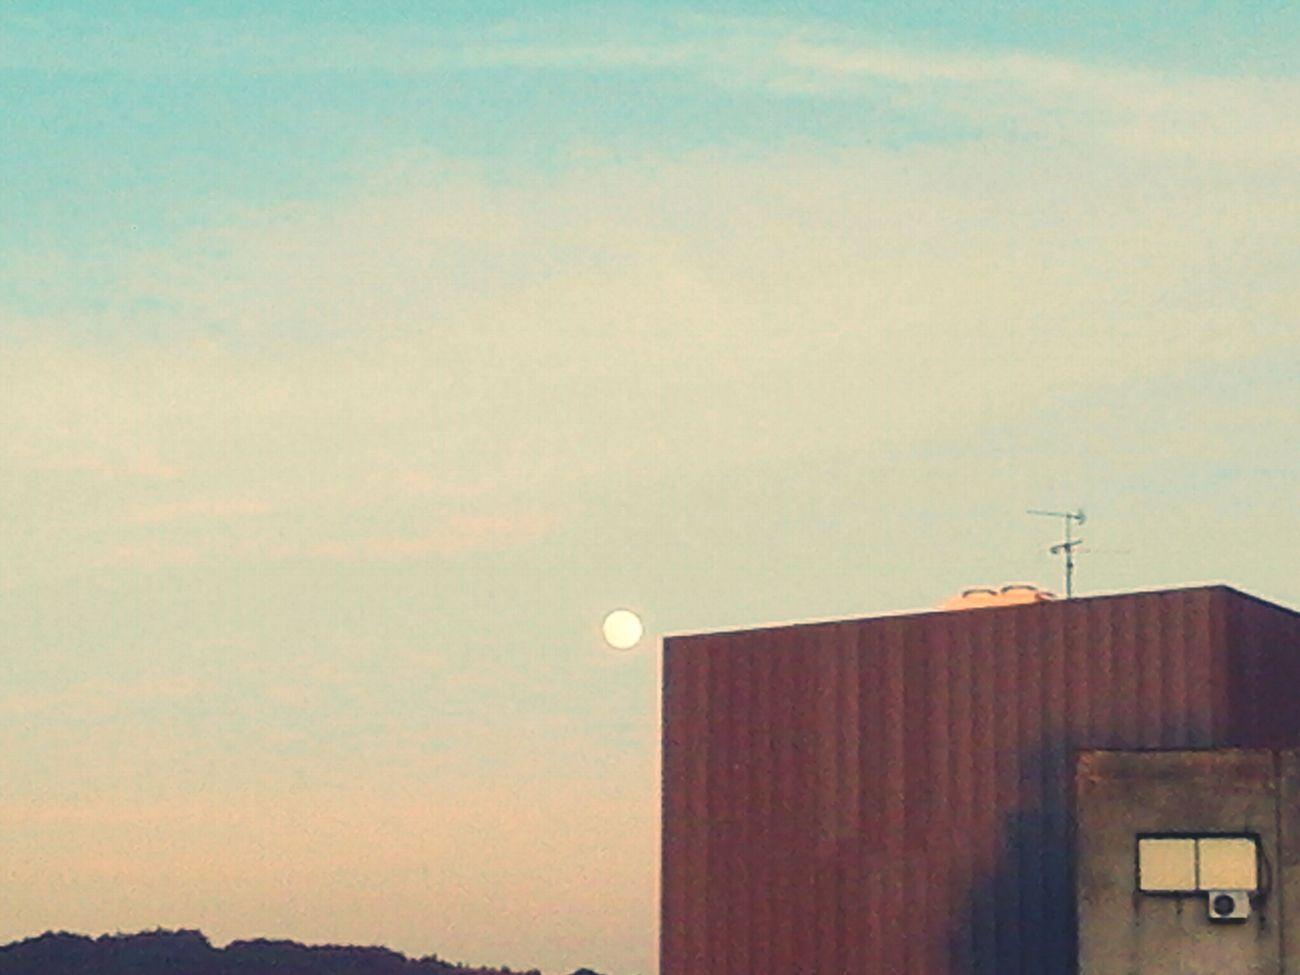 Lusco-fusco Full Moon